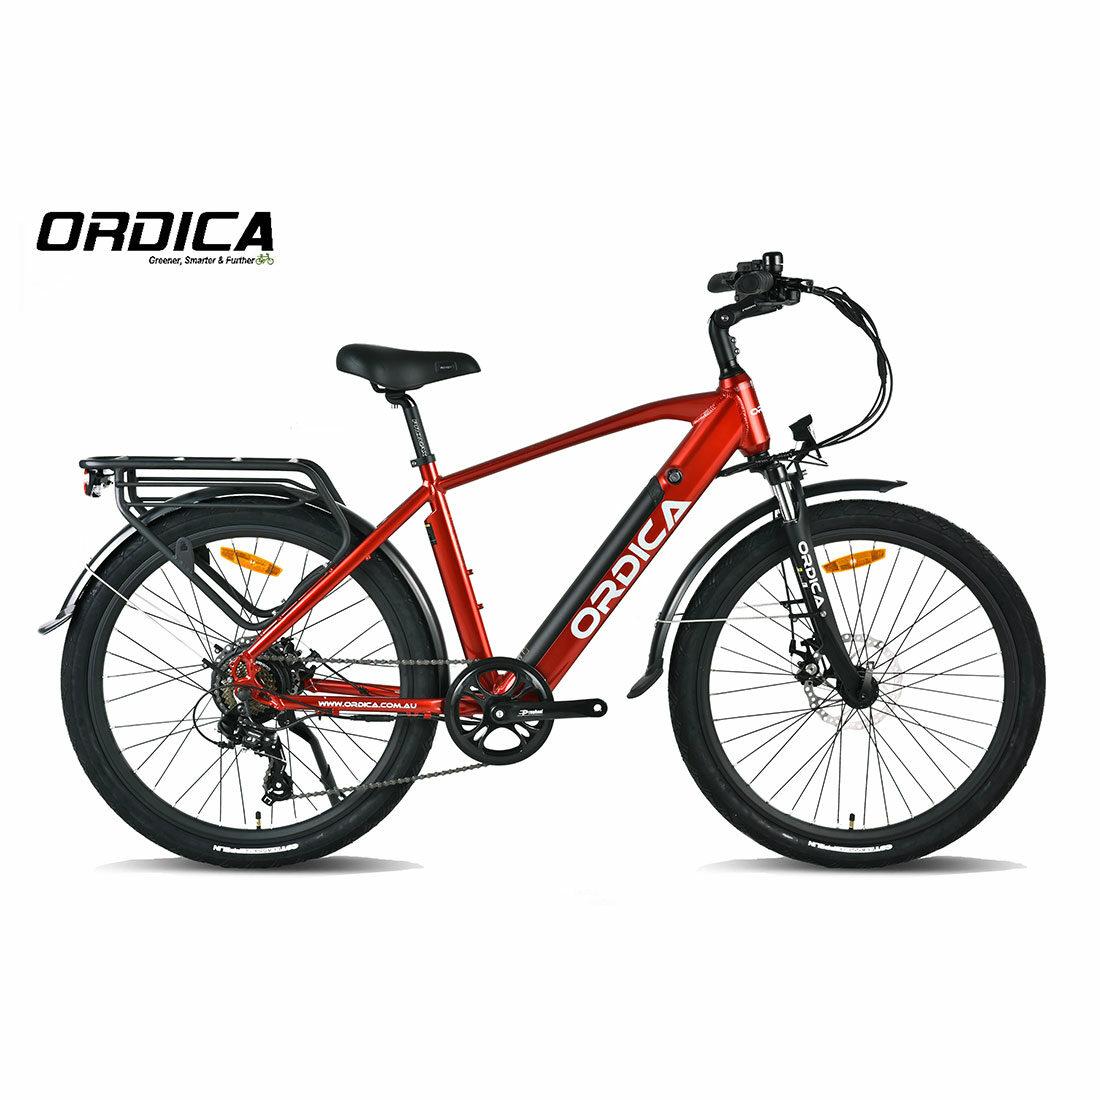 Ordica Swift Hybrid 26 Inch Red